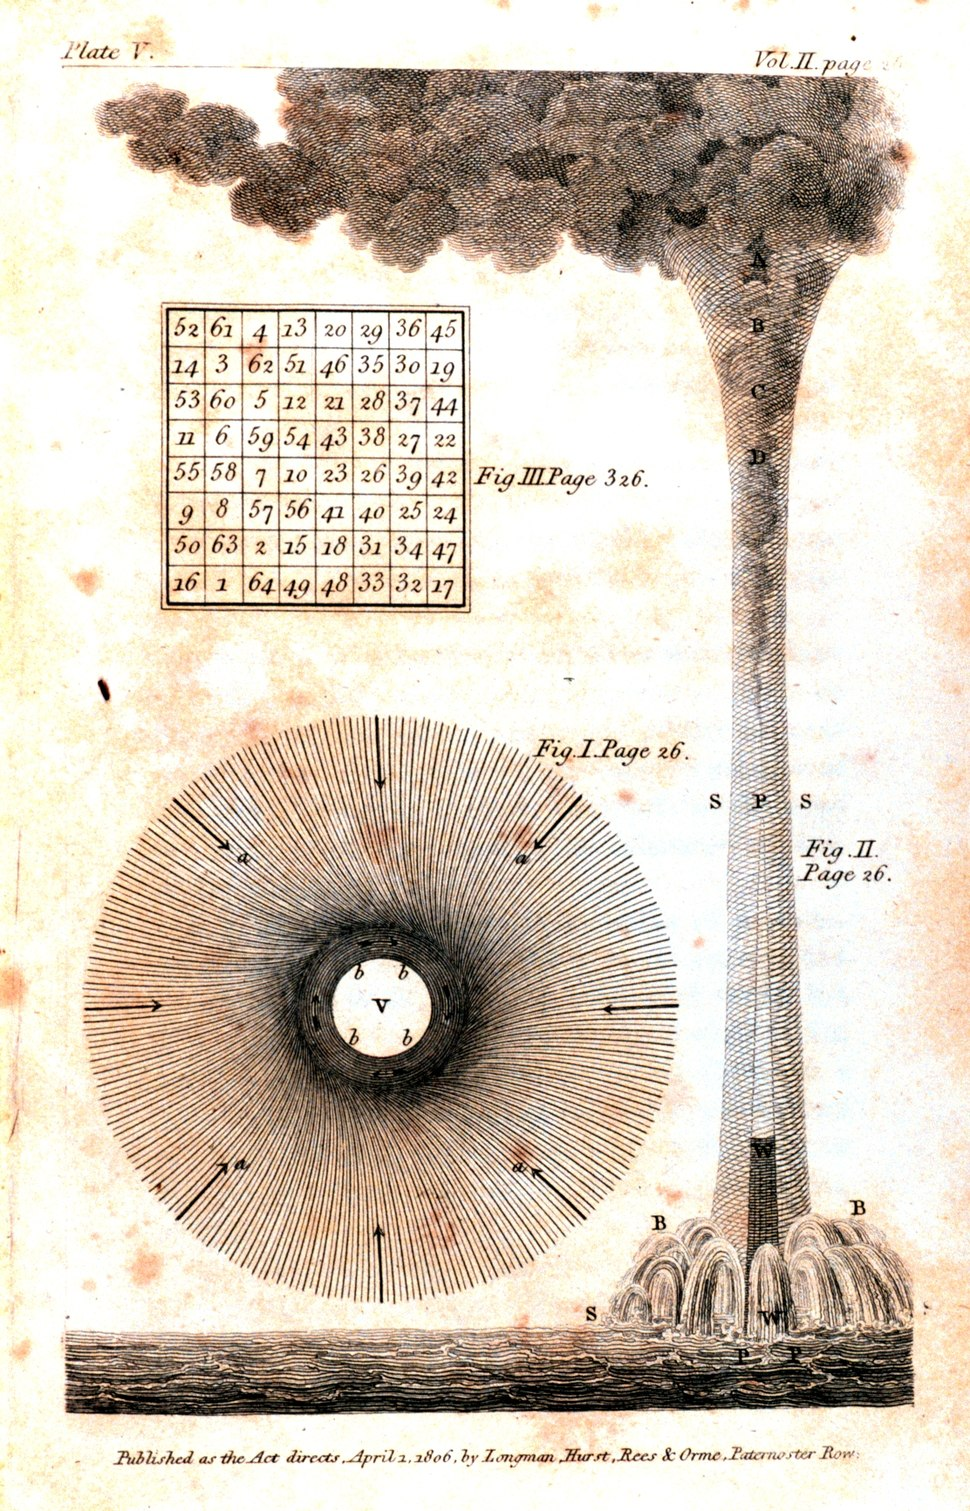 BenFranklin Waterspout 1806